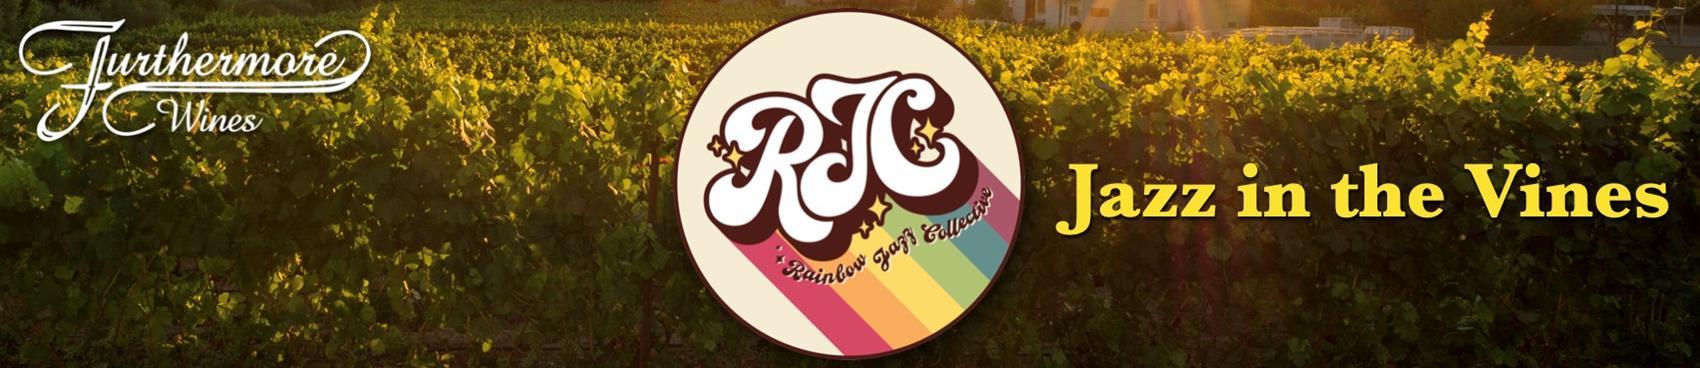 Rainbow Jazz Collective - Jazz in the Vines